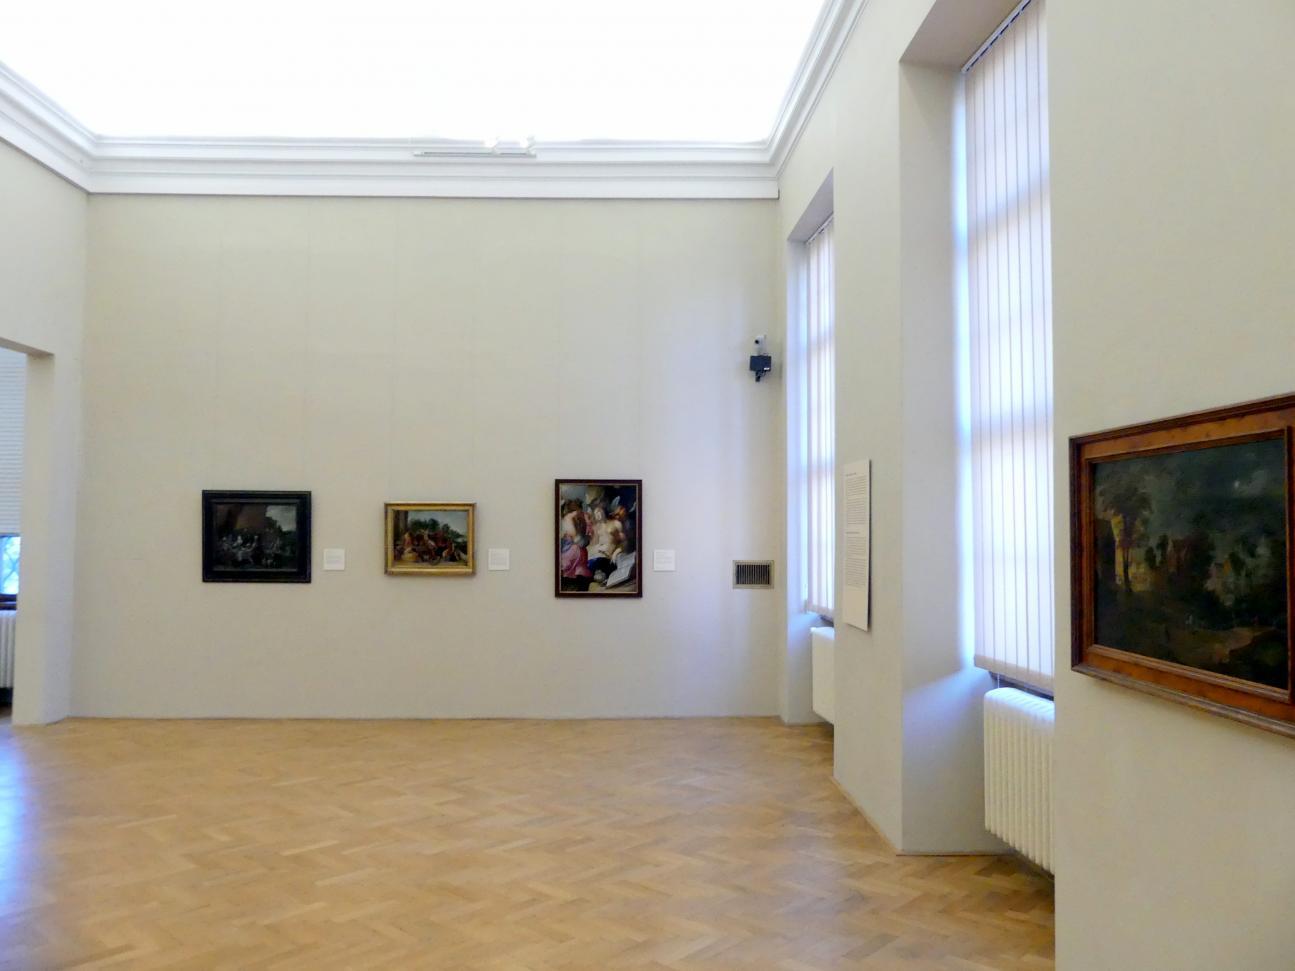 Prag, Nationalgalerie im Palais Sternberg, 2. Obergeschoss, Saal 11, Bild 3/5